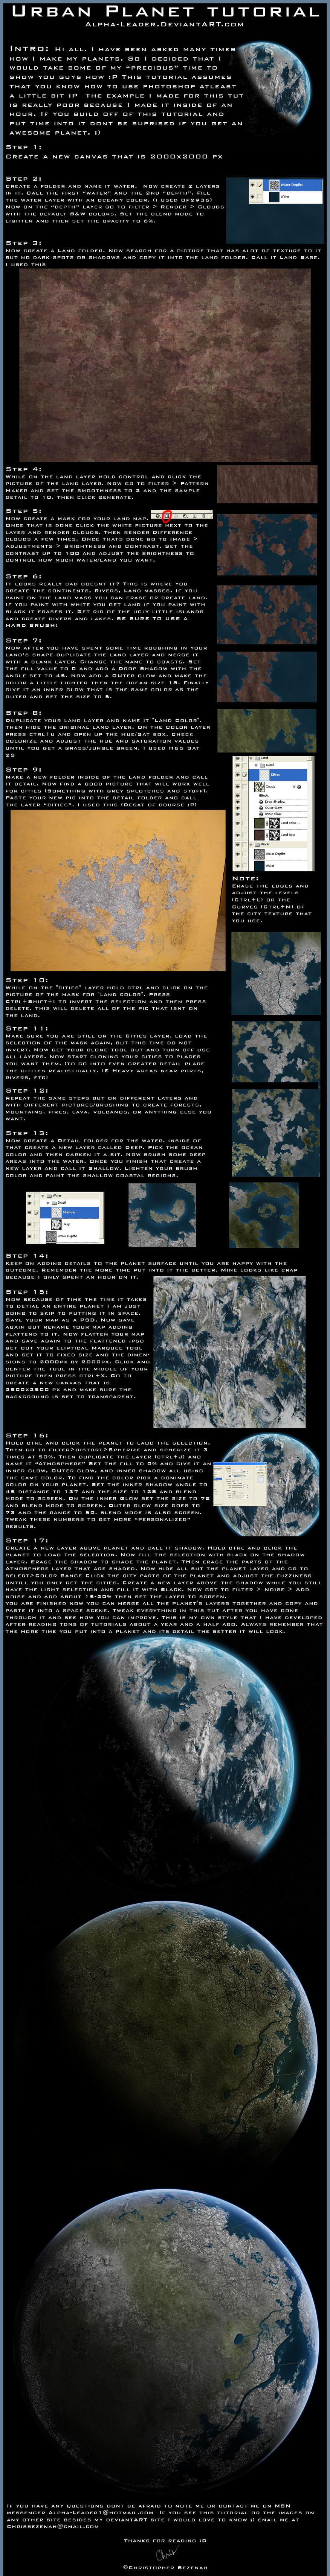 Urban Planet Tutorial by Alpha-Leader